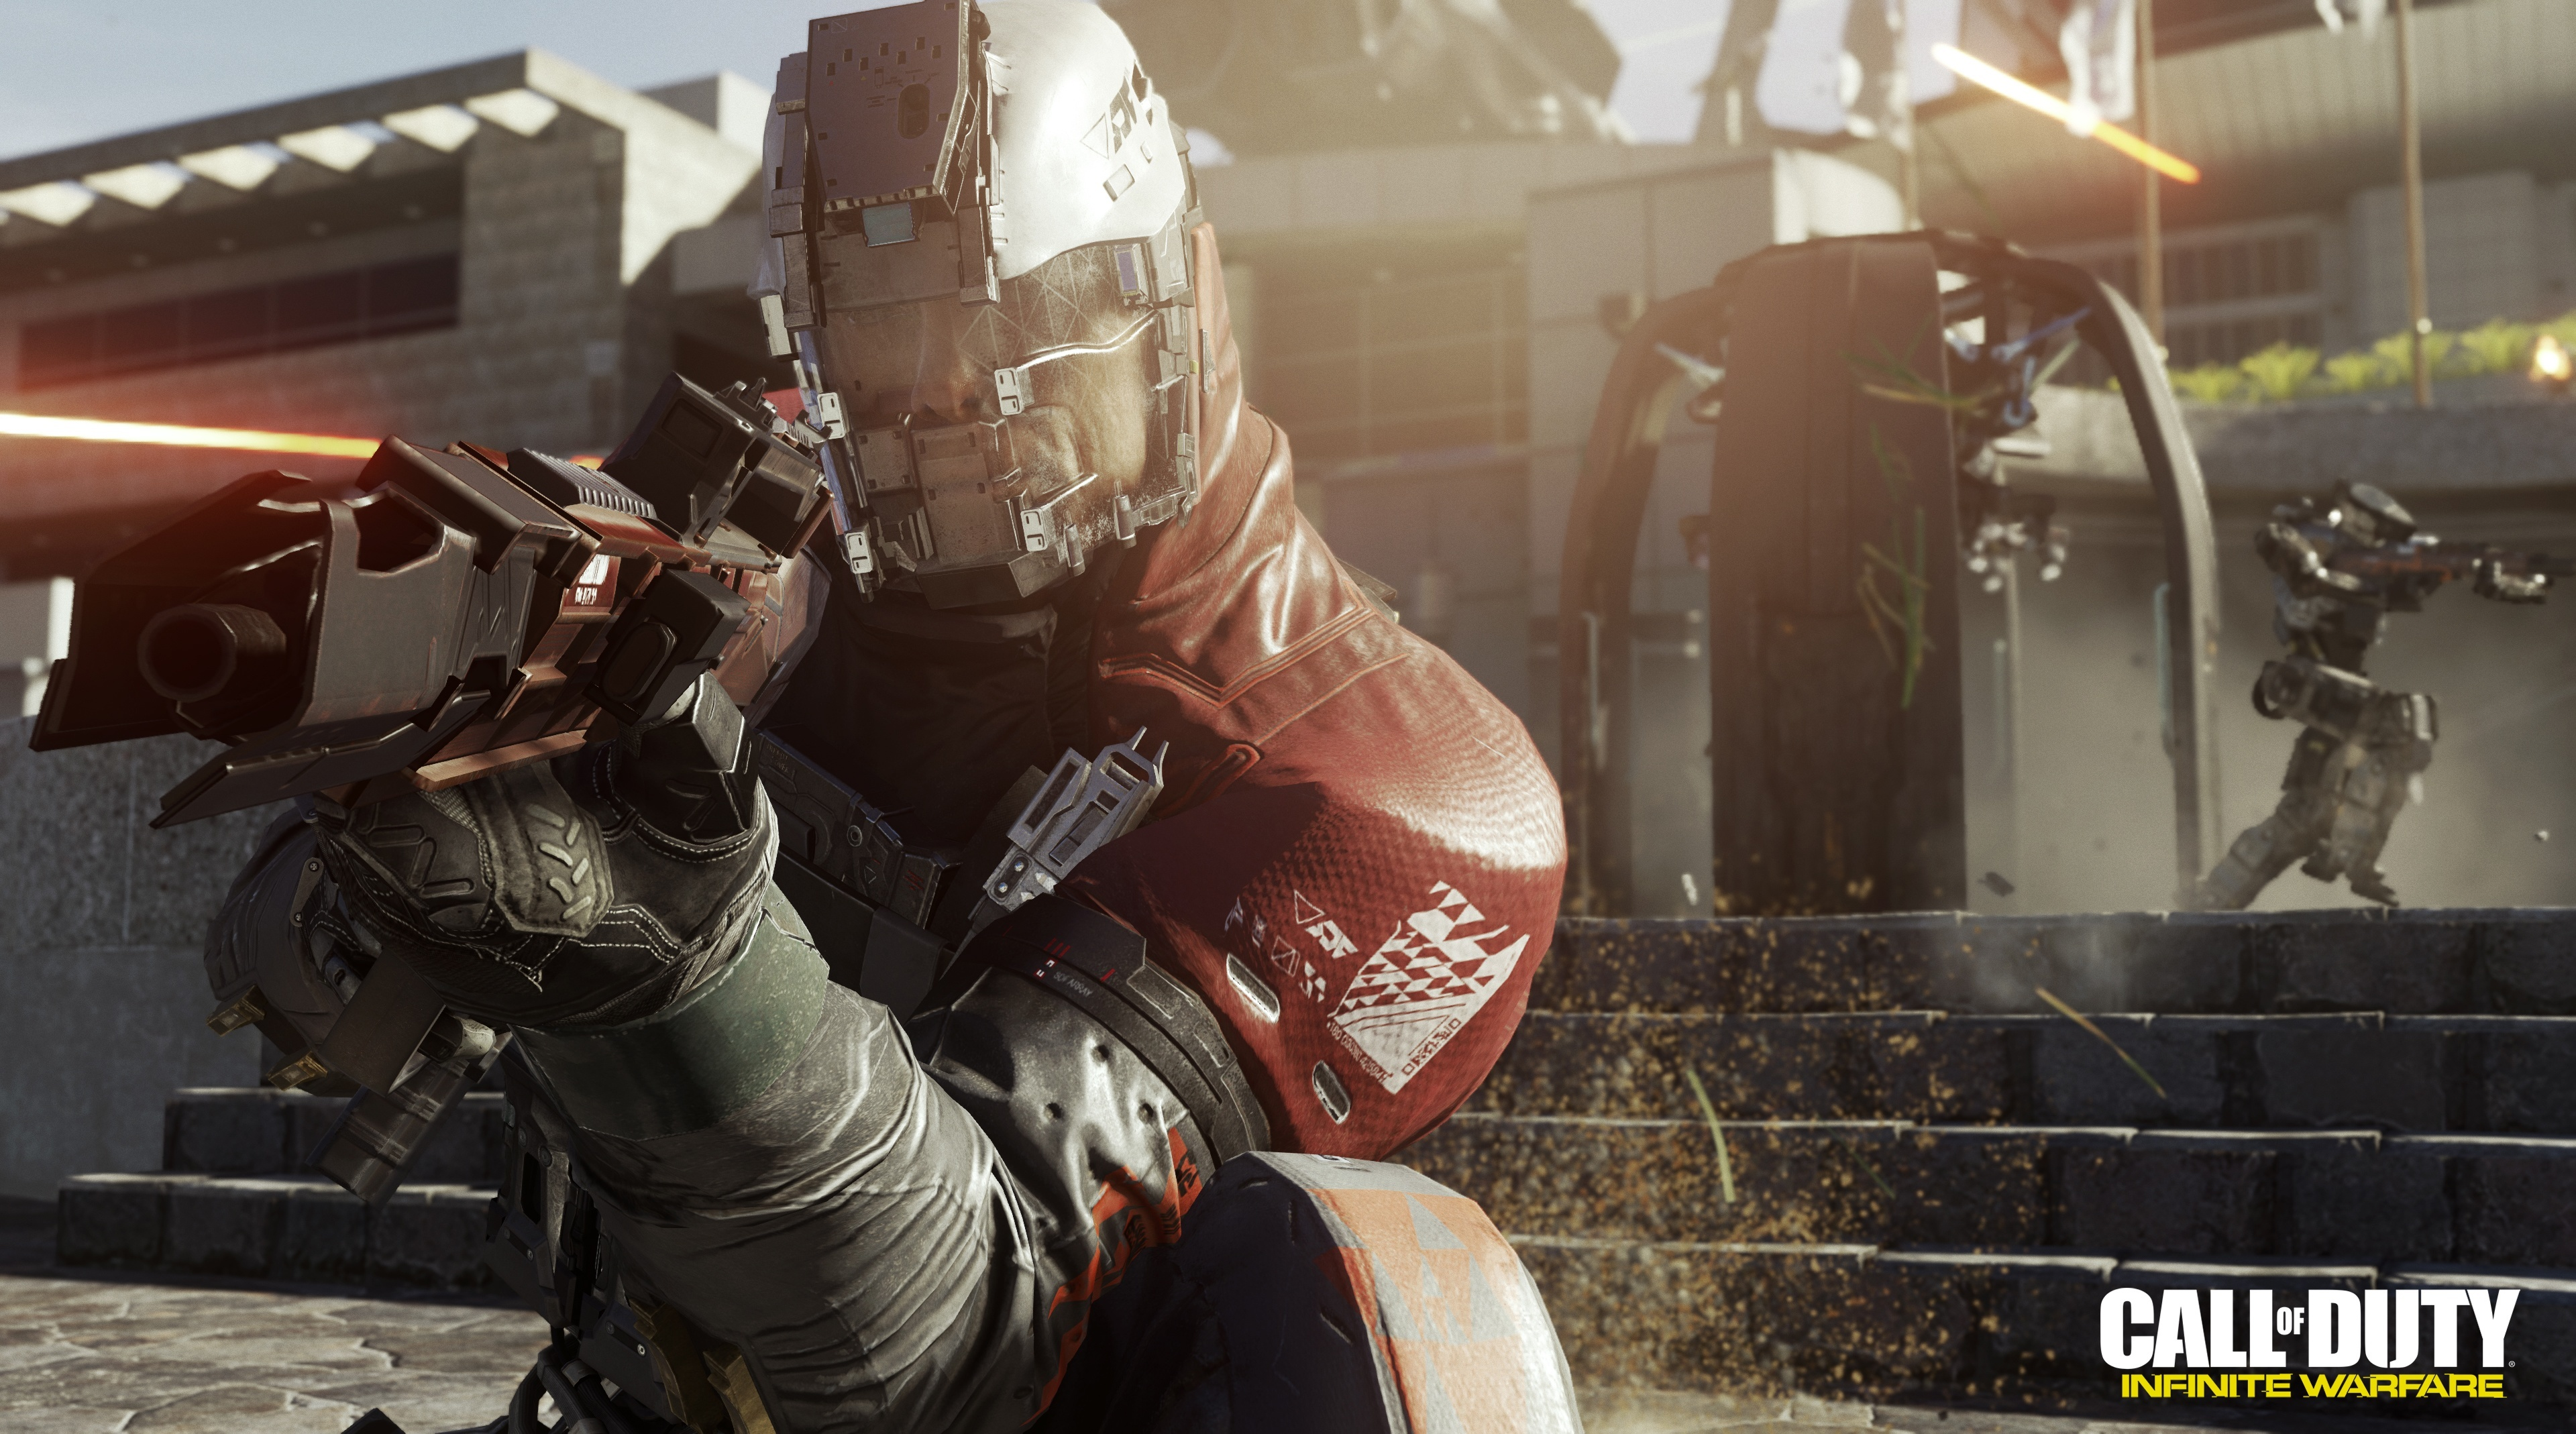 Cod Infinite Warfare Wallpaper: Call Of Duty Infinite Warfare, HD Games, 4k Wallpapers